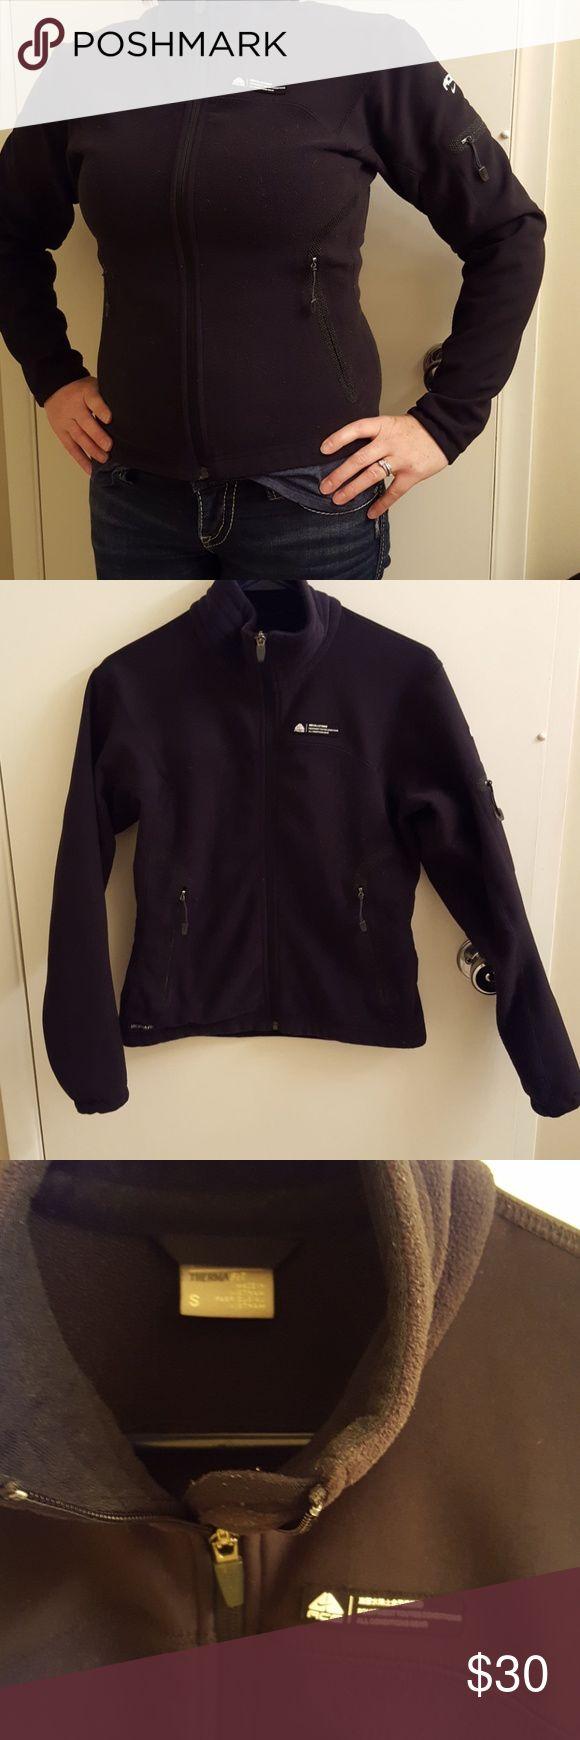 Nike ACG Therma Fit Jacket Barely worn gorgeous and super warm jacket! Nike ACG Jackets & Coats